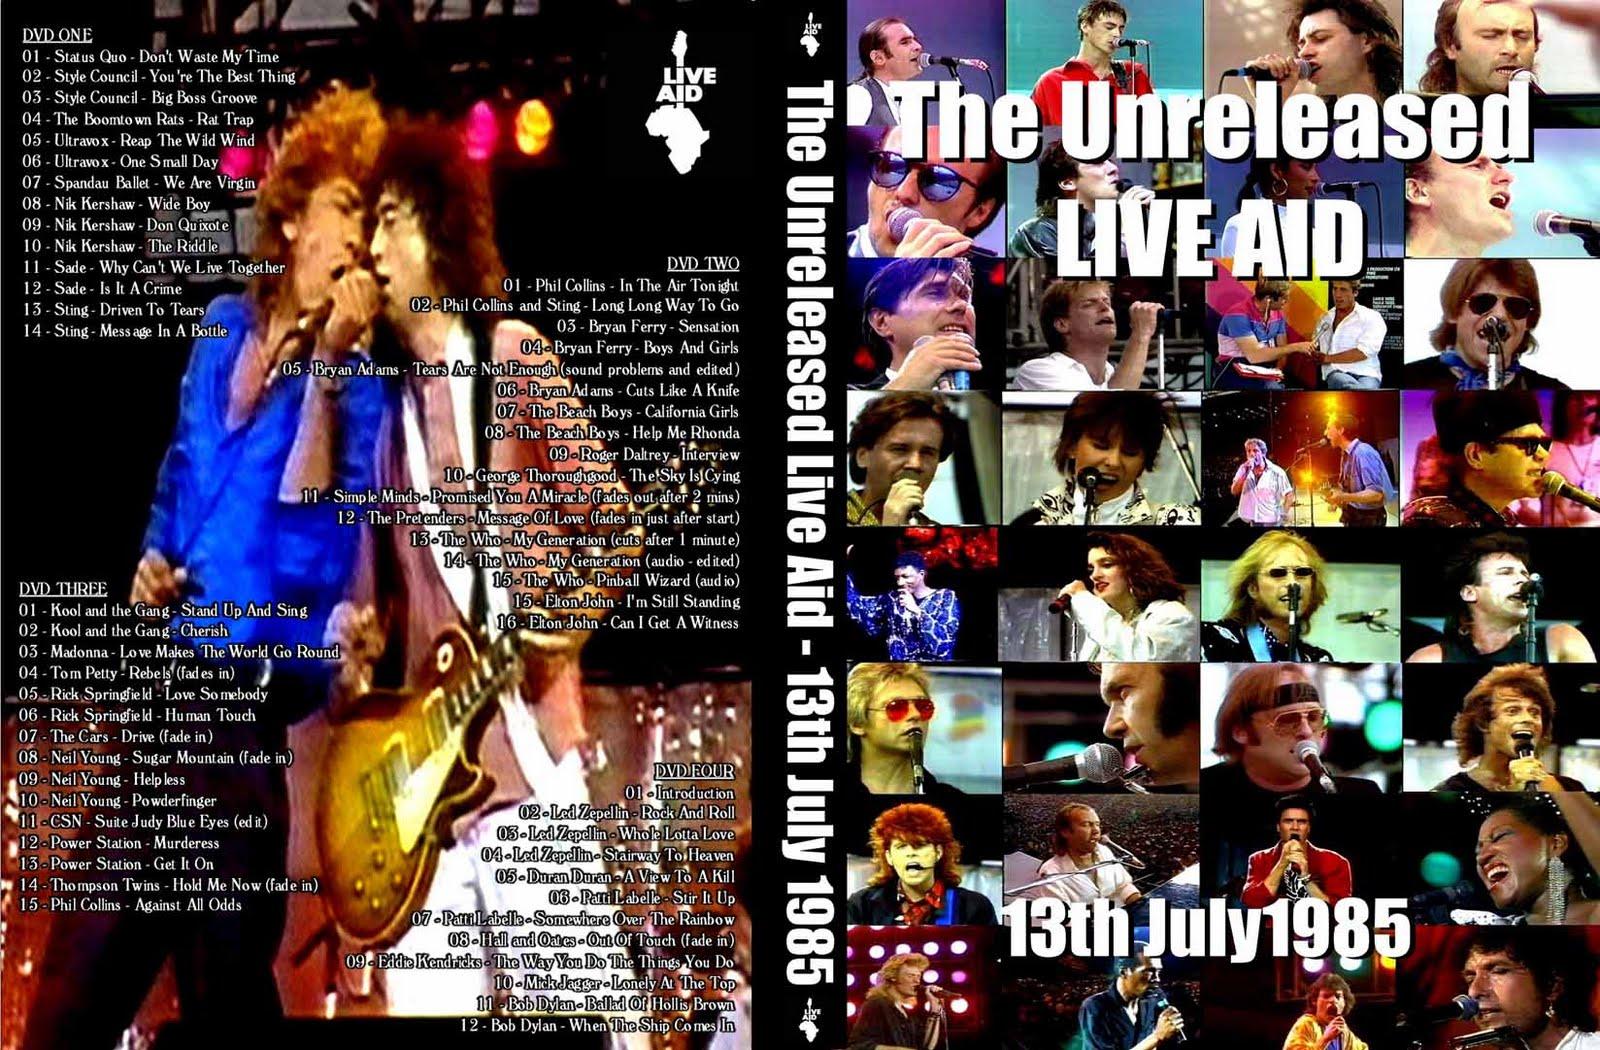 http://1.bp.blogspot.com/-WIBgZsb-nkk/Tid_zAxzoQI/AAAAAAAADH8/T5sNo6BAtUw/s1600/DVD+Cover+-+The+Unreleased+Live+Aid+DVD+2.jpg